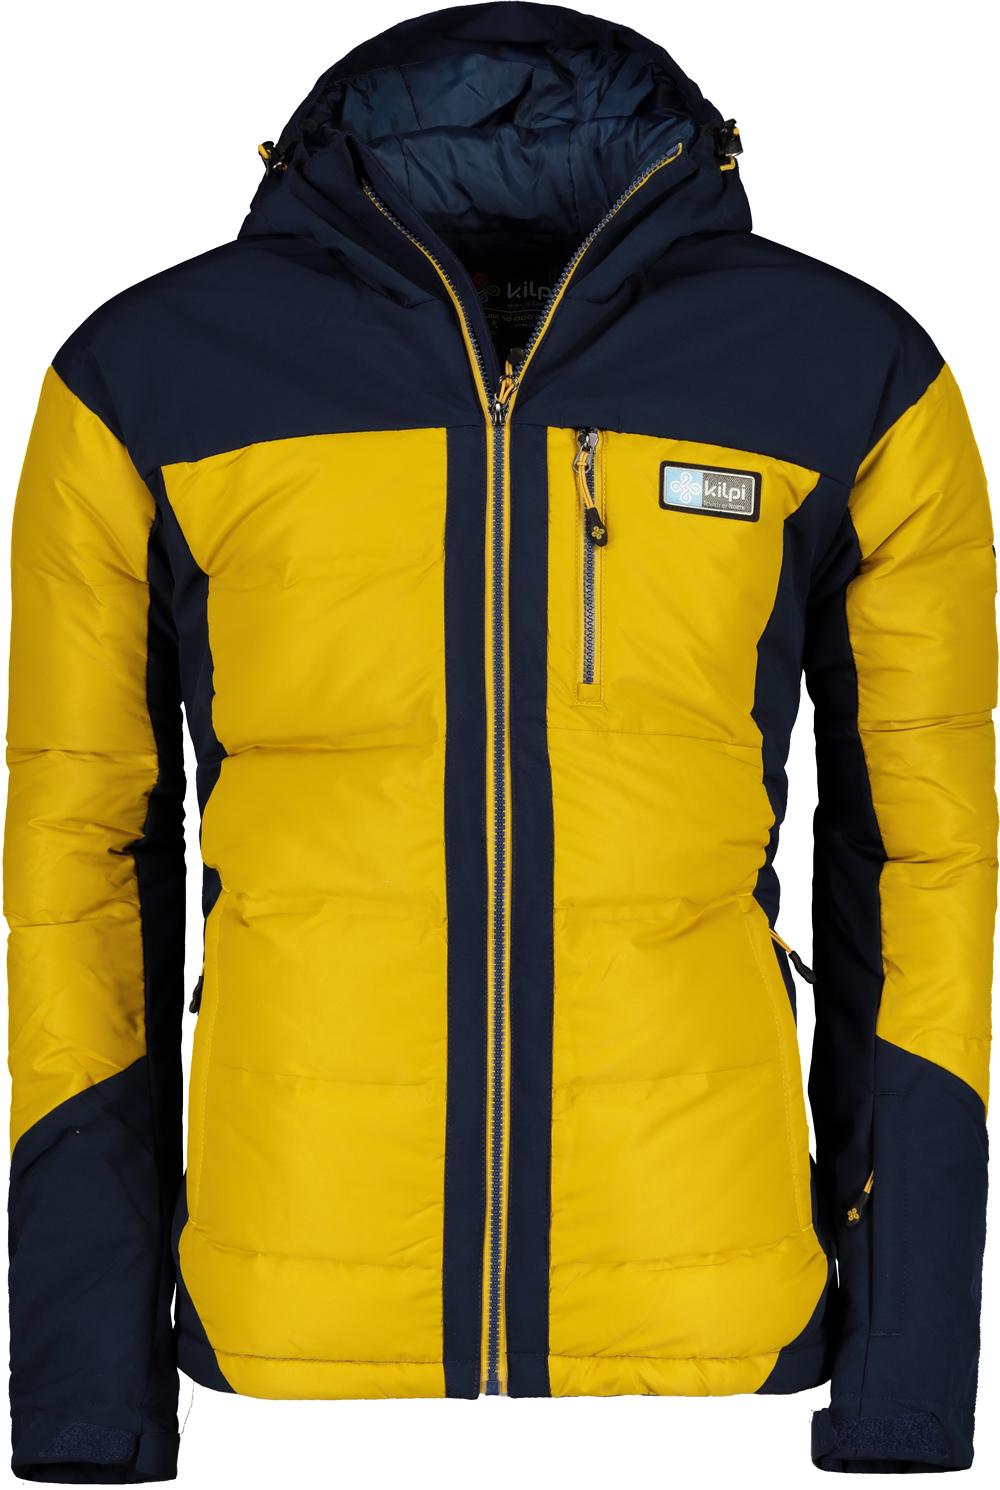 Bunda lyžařská pánská Kilpi HELIOS-M